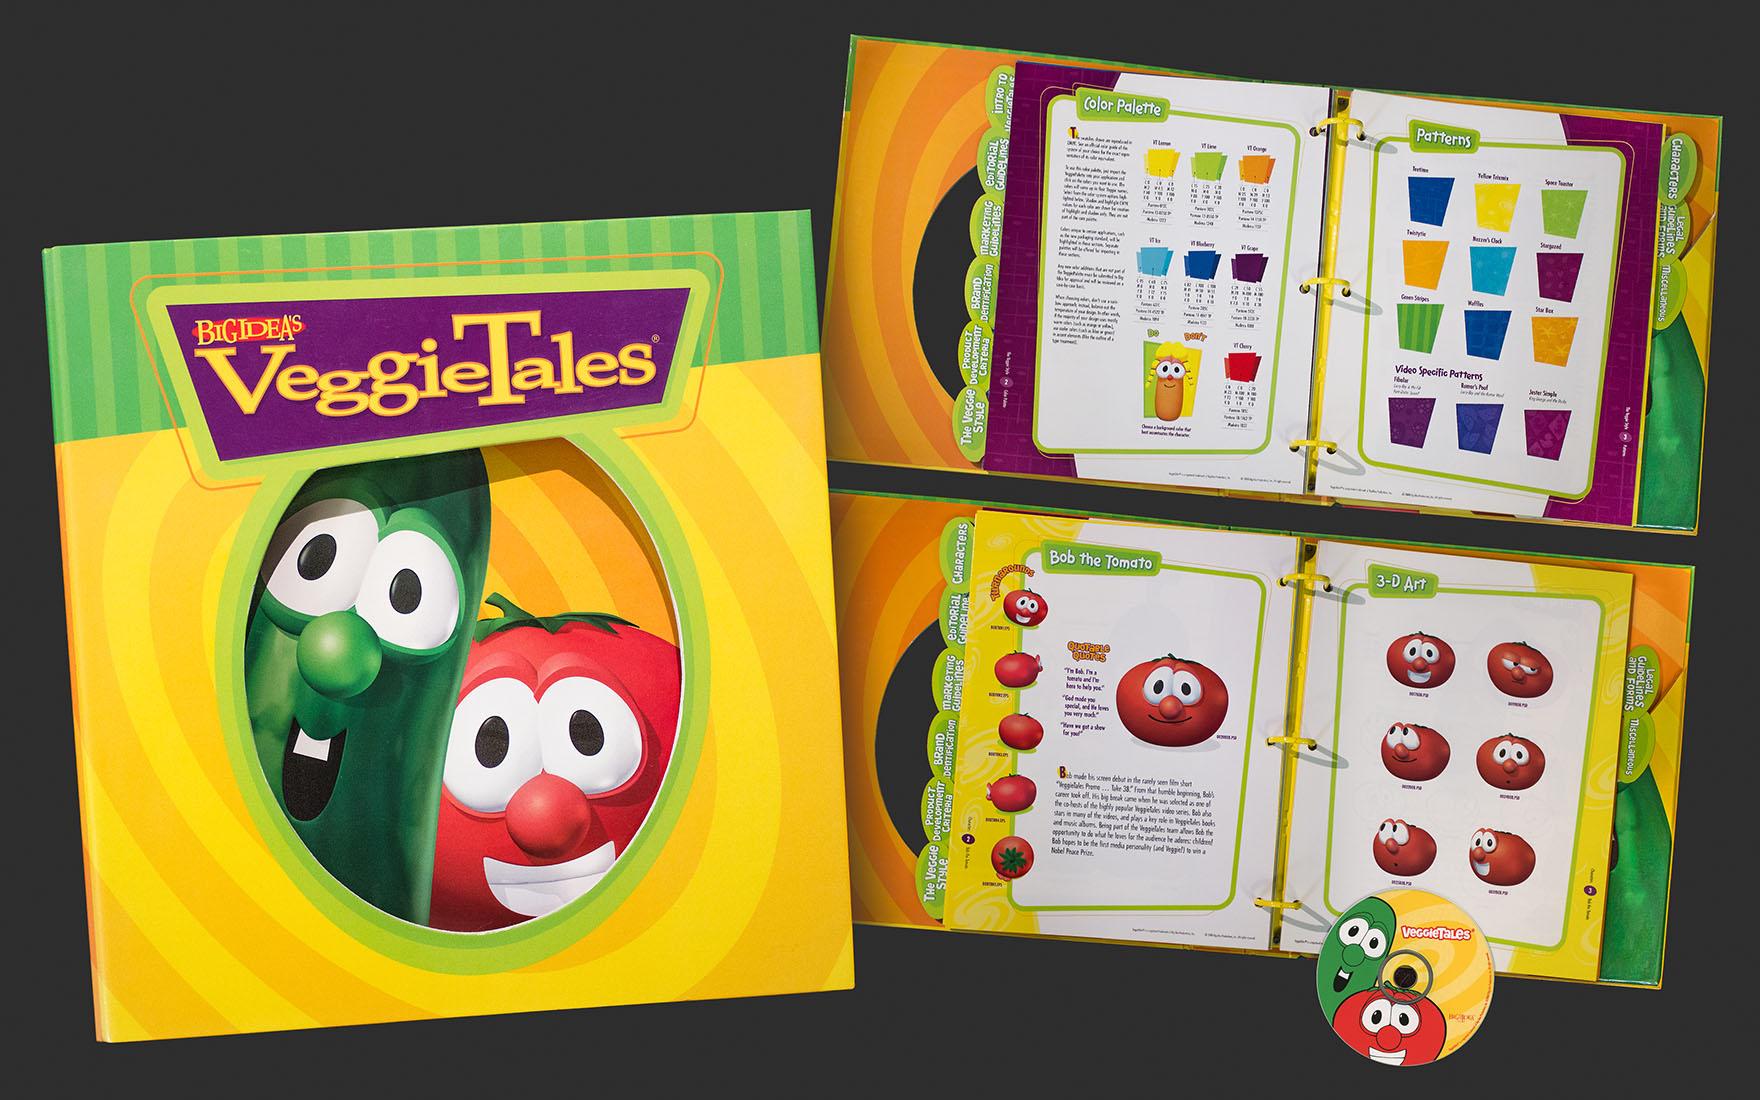 Collateral-StyleGuide-VeggieTales